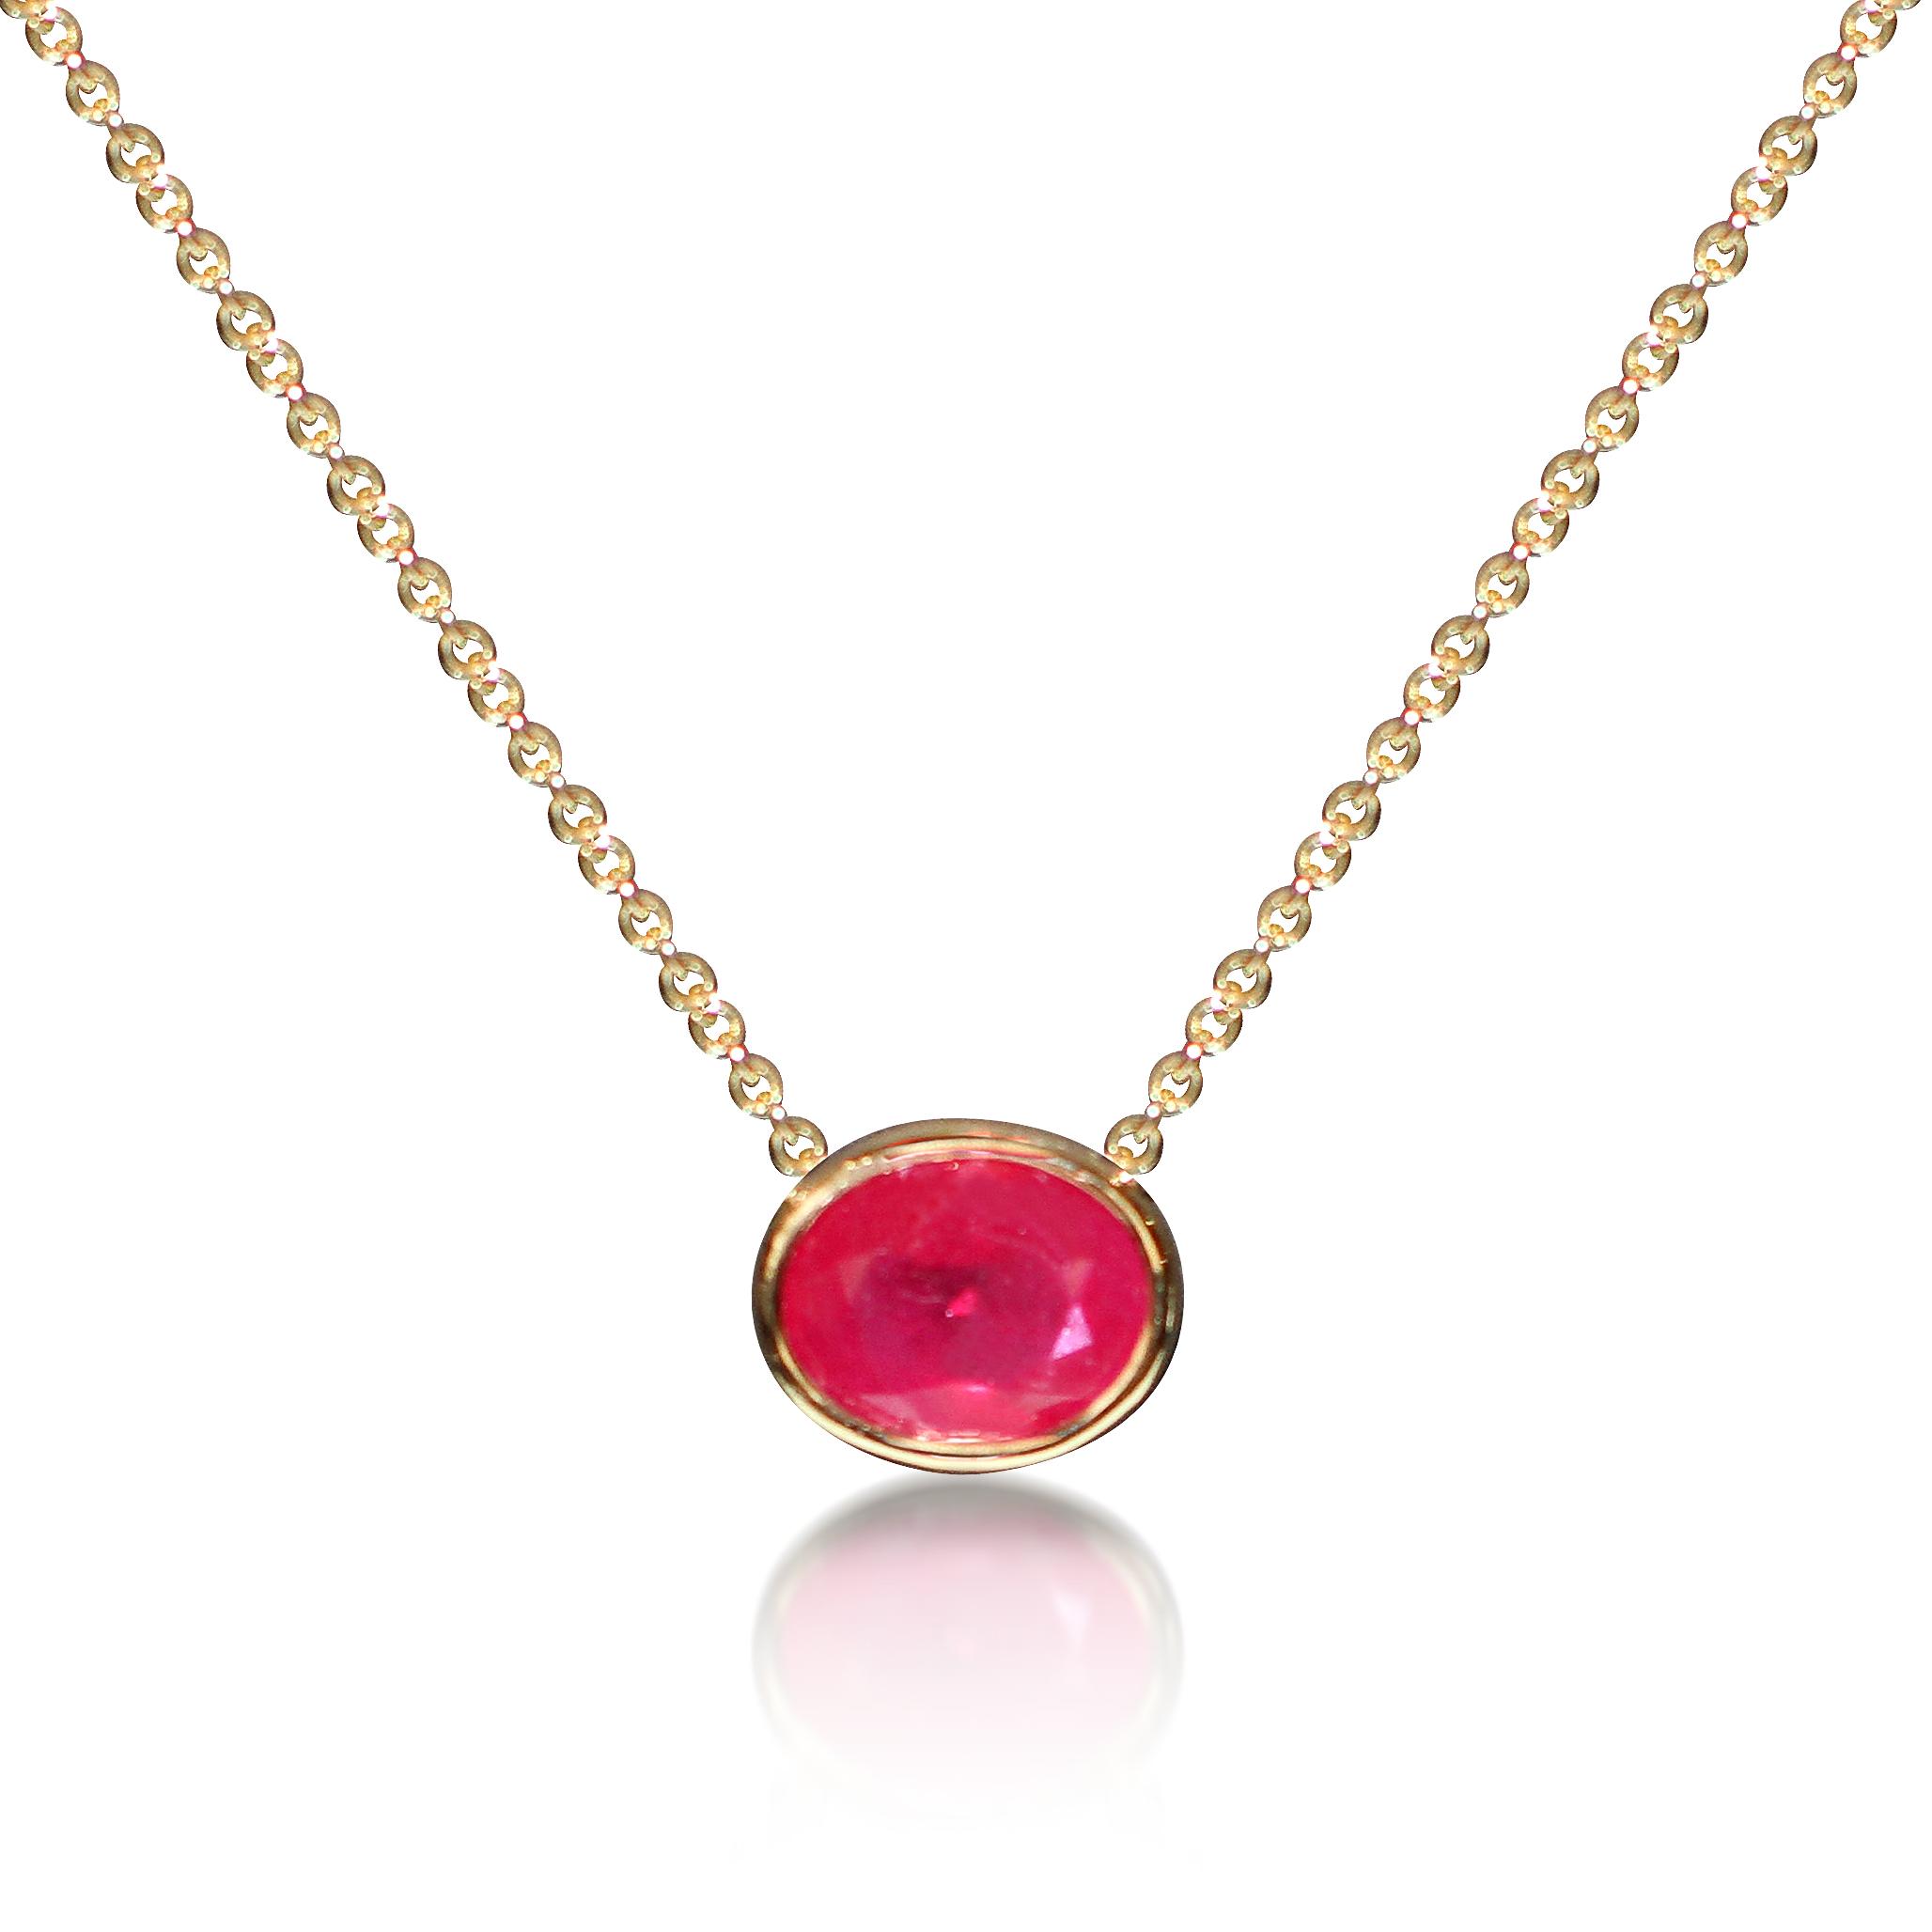 Ruby single stone necklace